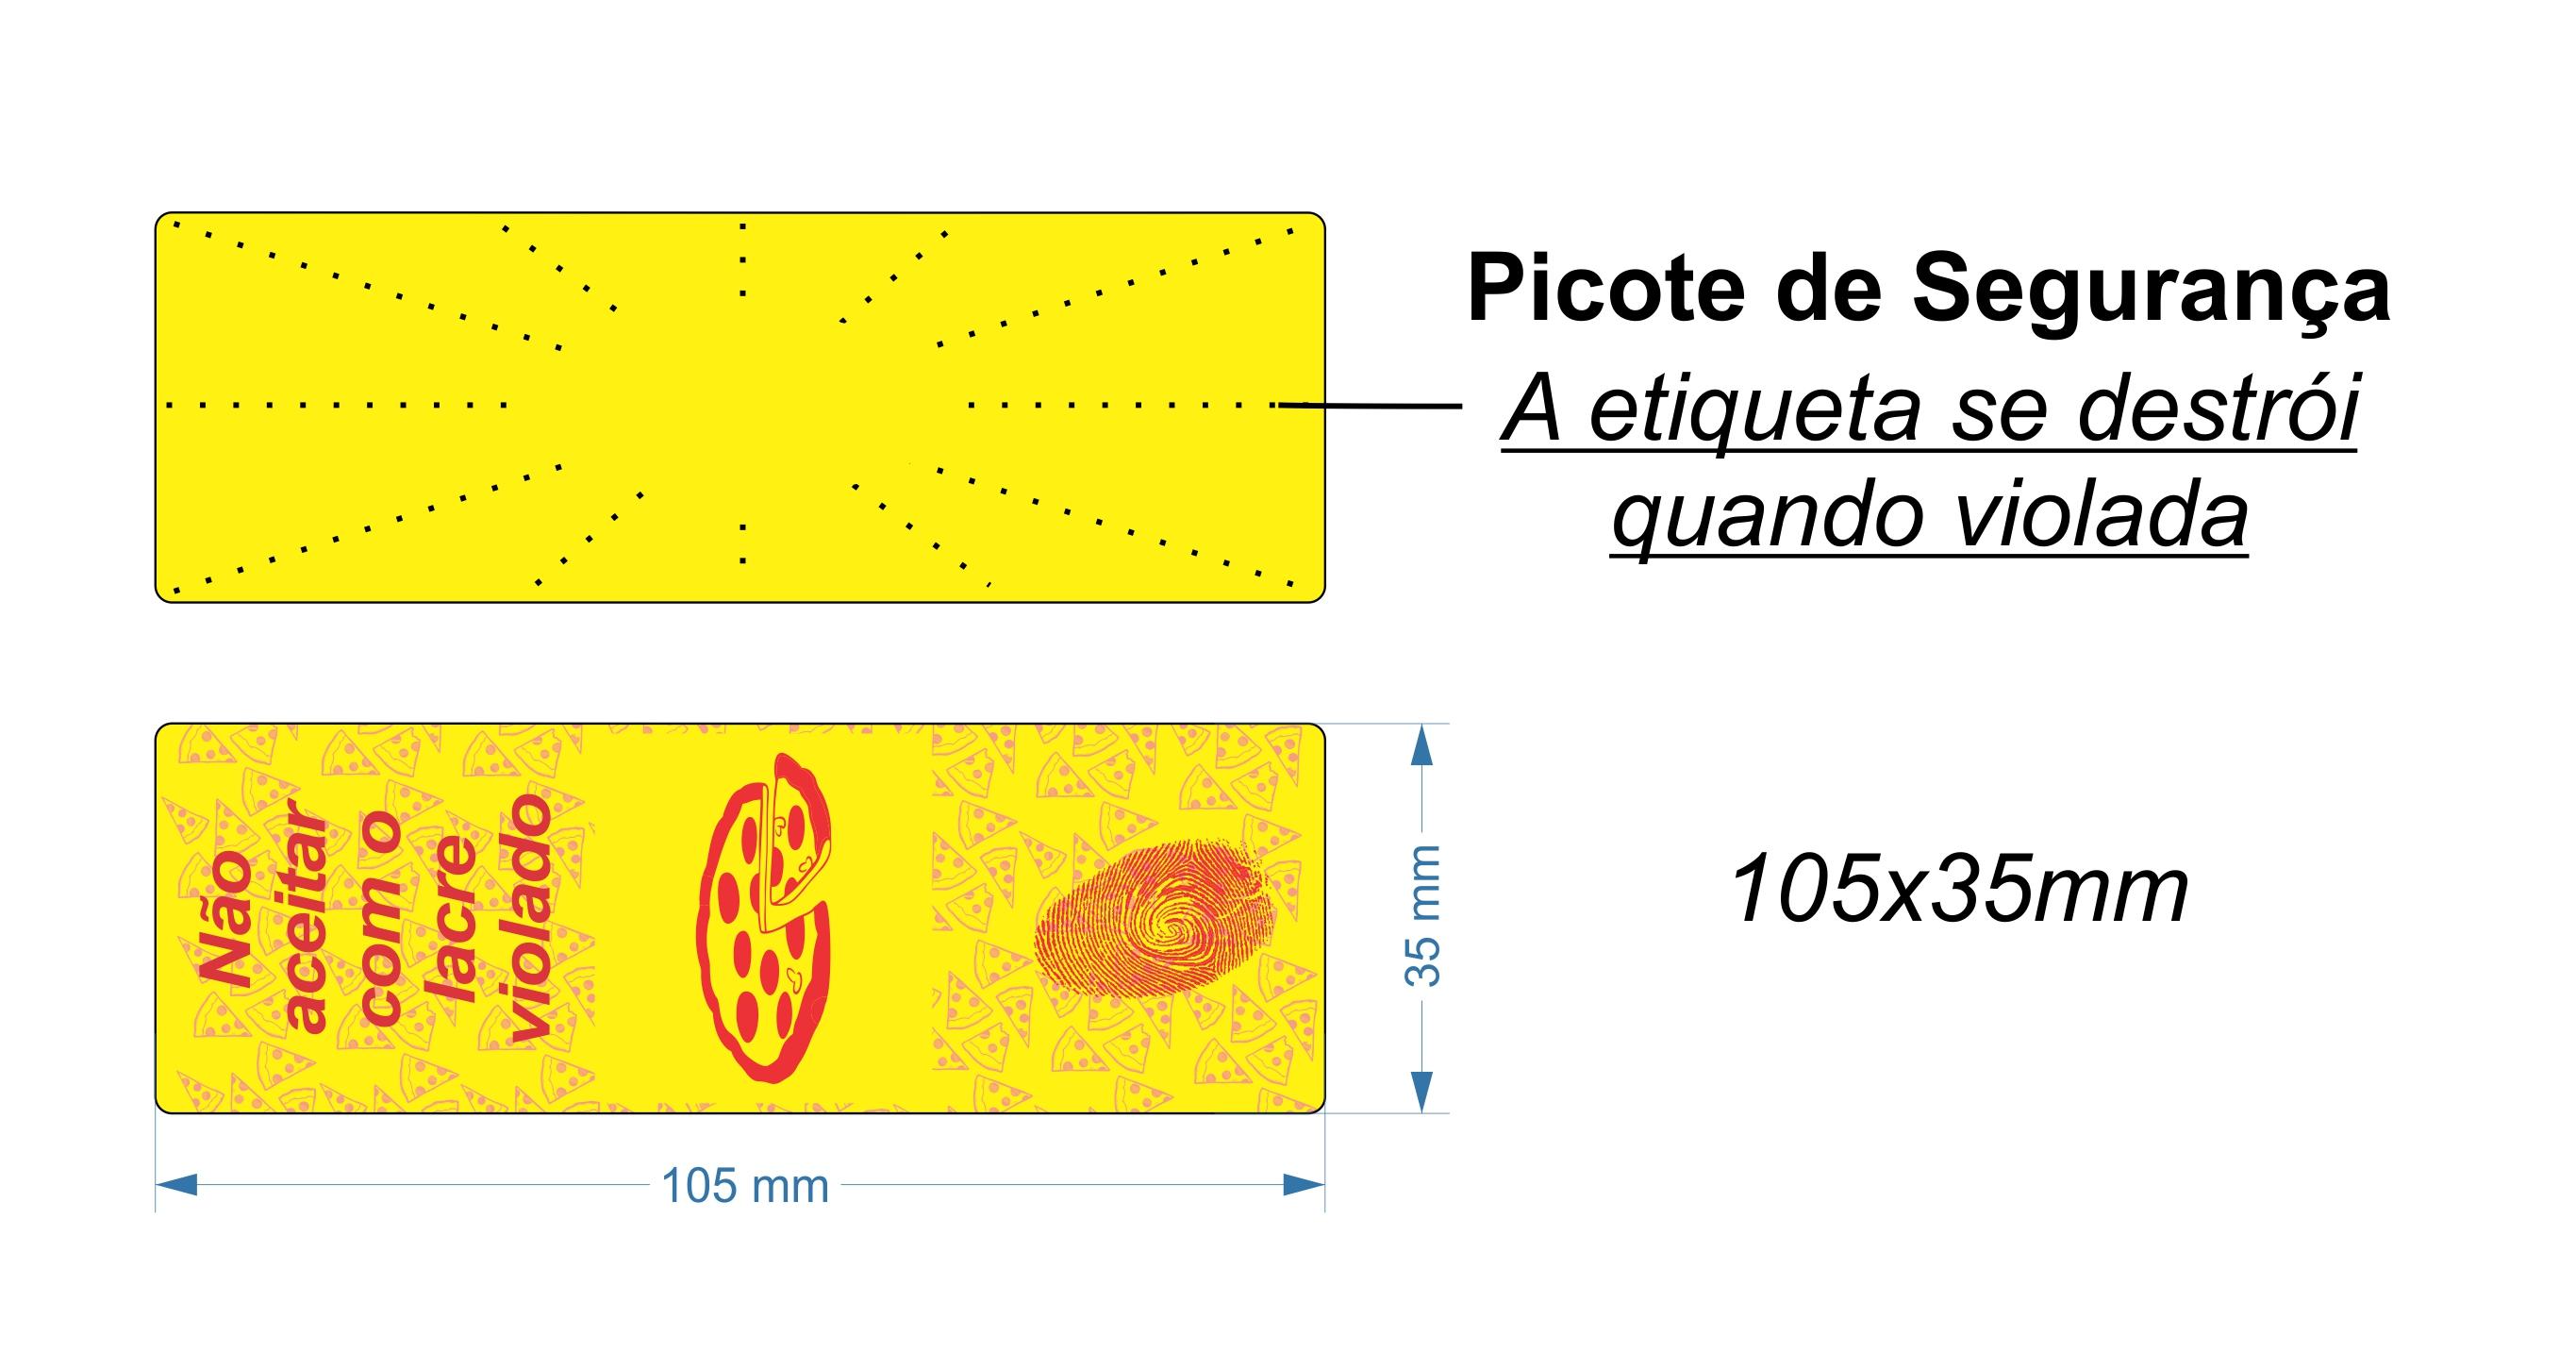 Lacre para Delivery de Pizza - Etiqueta Adesiva